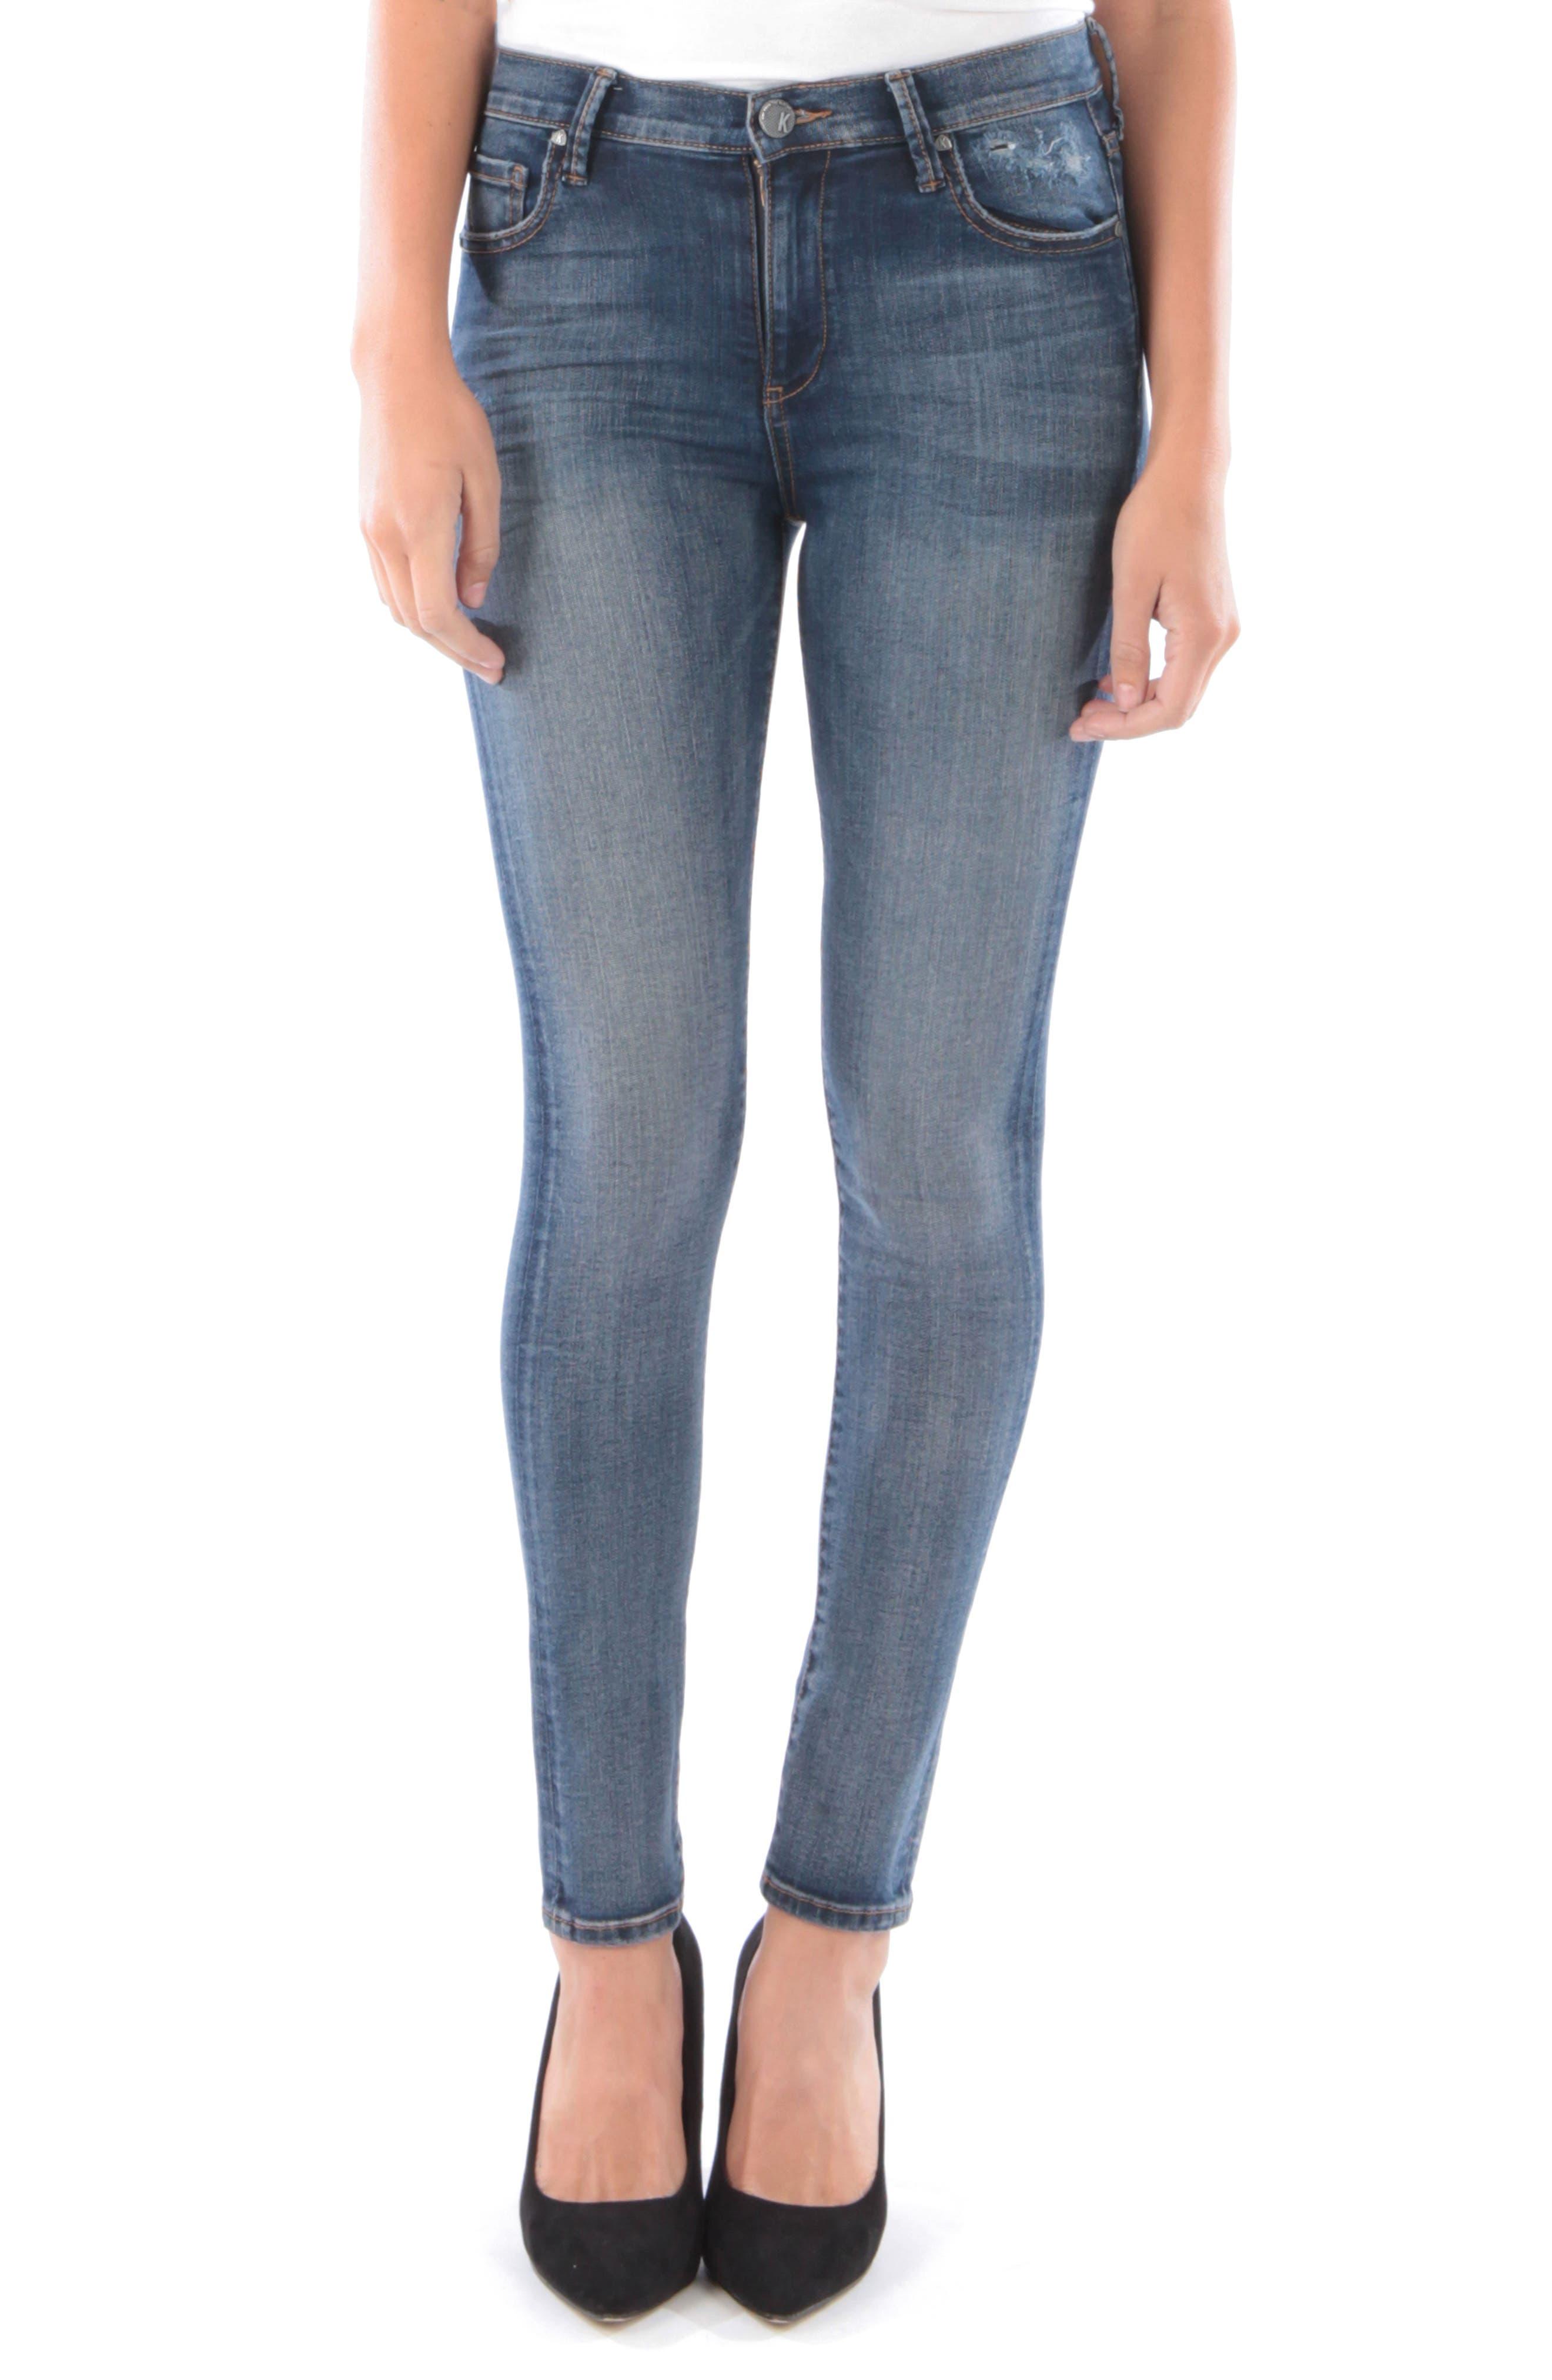 Kut From The Kloth Mia High Waist Skinny Jeans, Blue